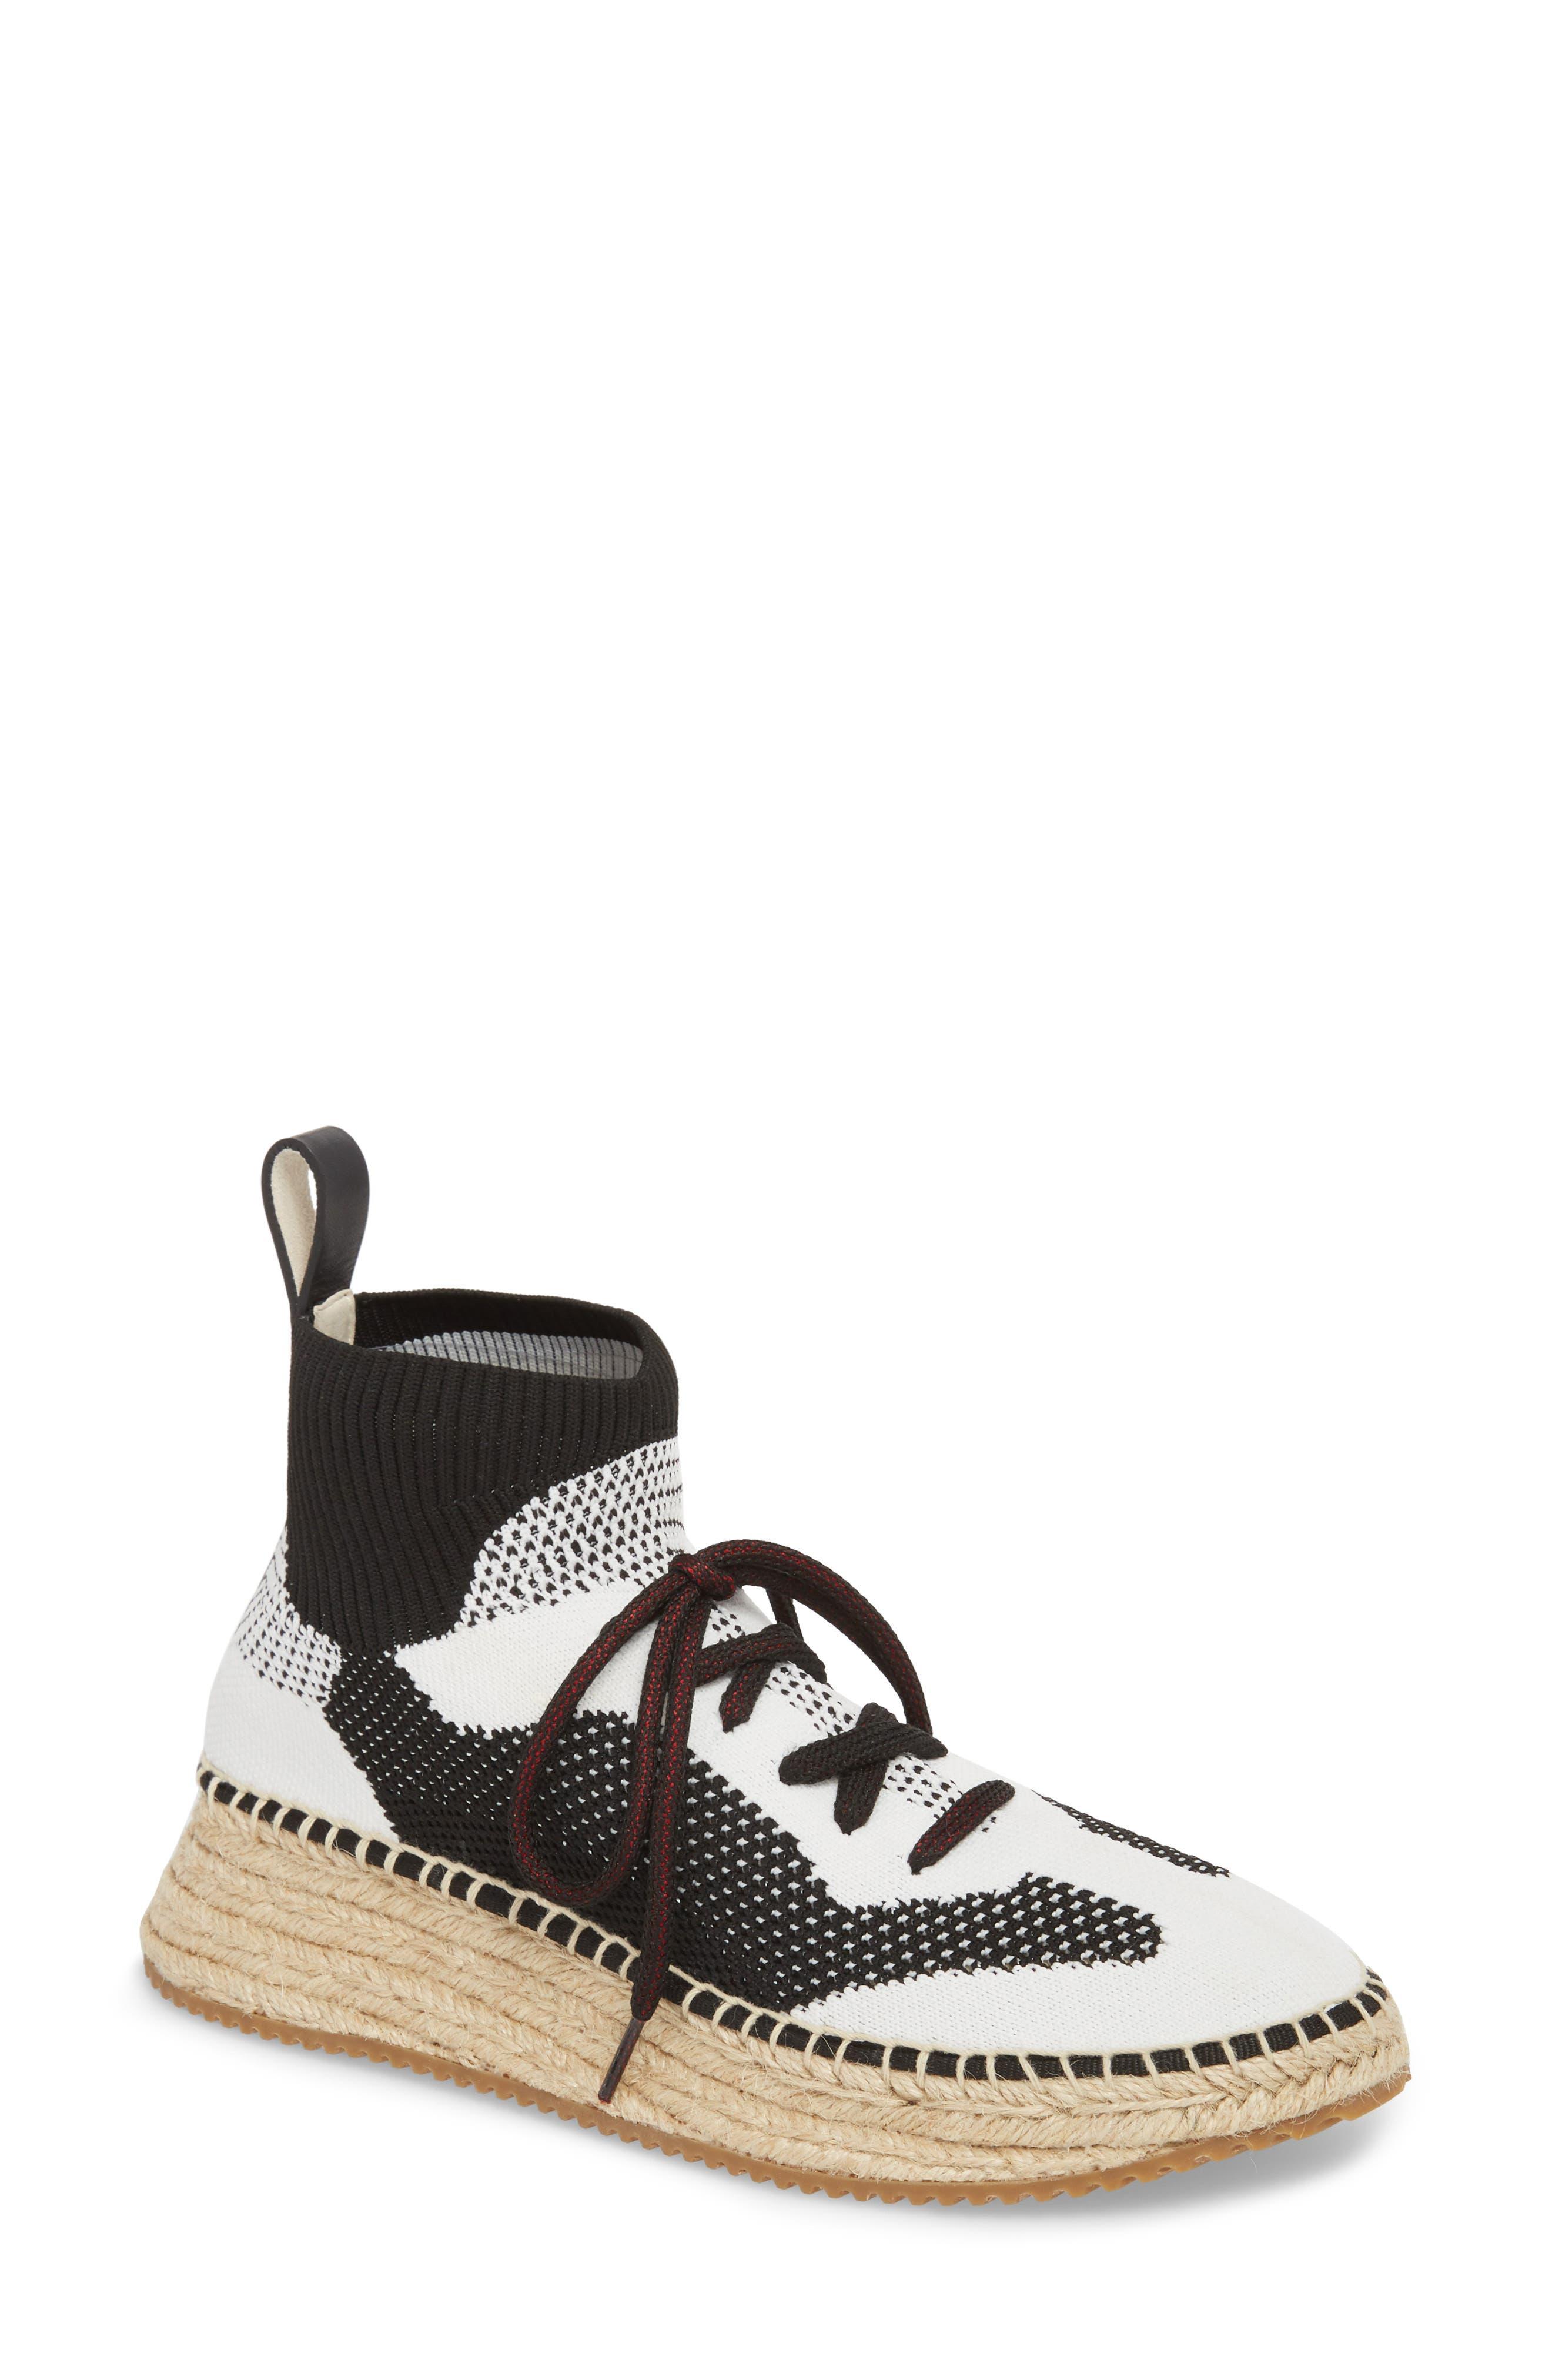 Dakota Espadrille Sock Sneaker,                         Main,                         color, 002